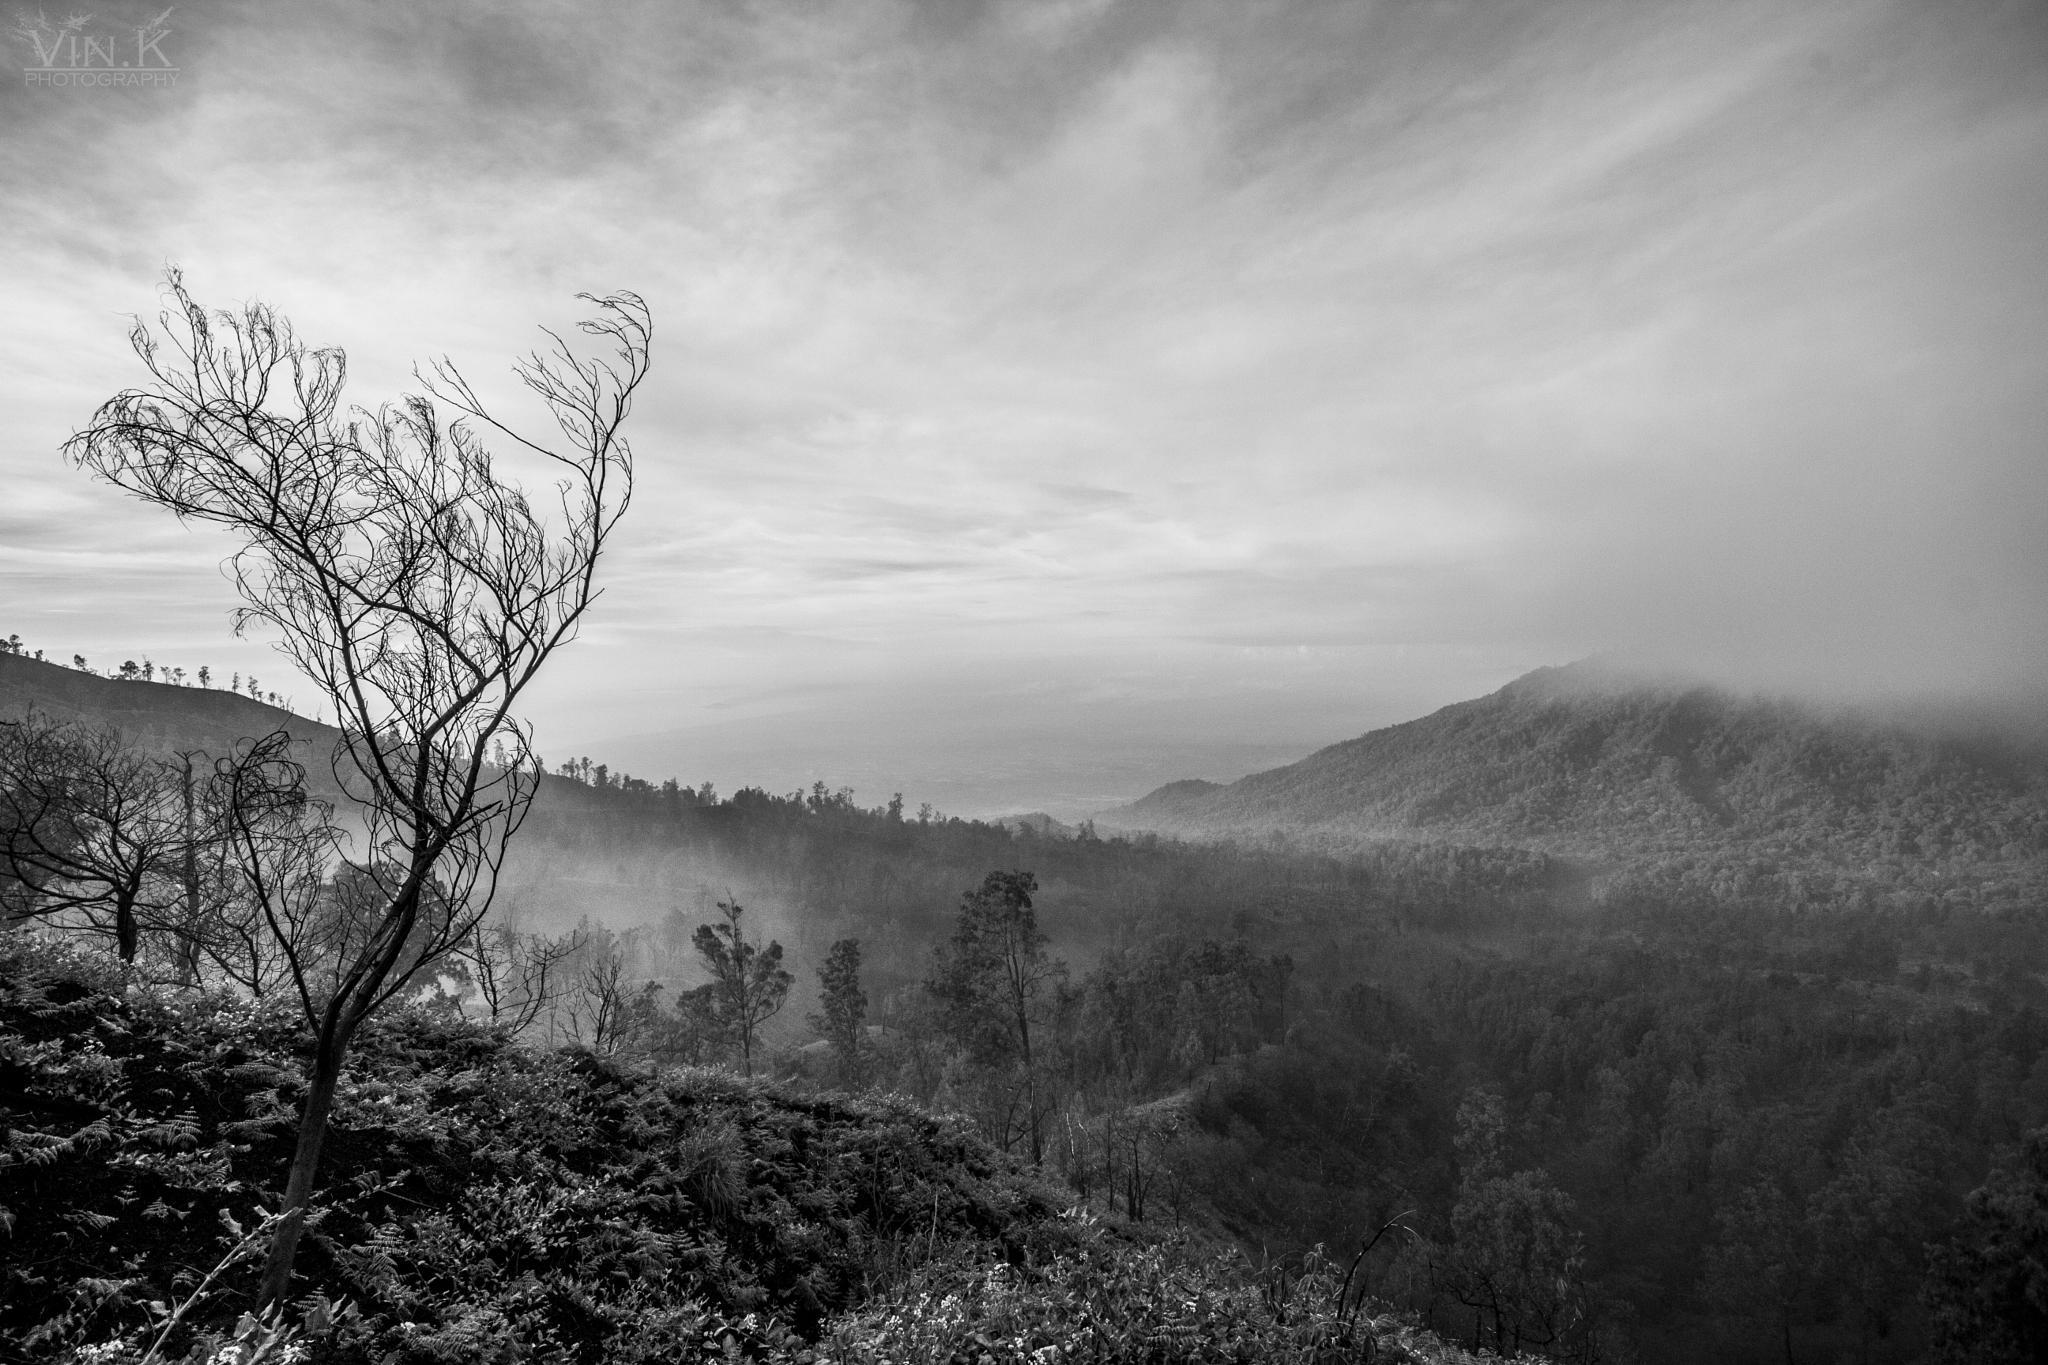 Magical Monochrome Mornings. by Vin.K